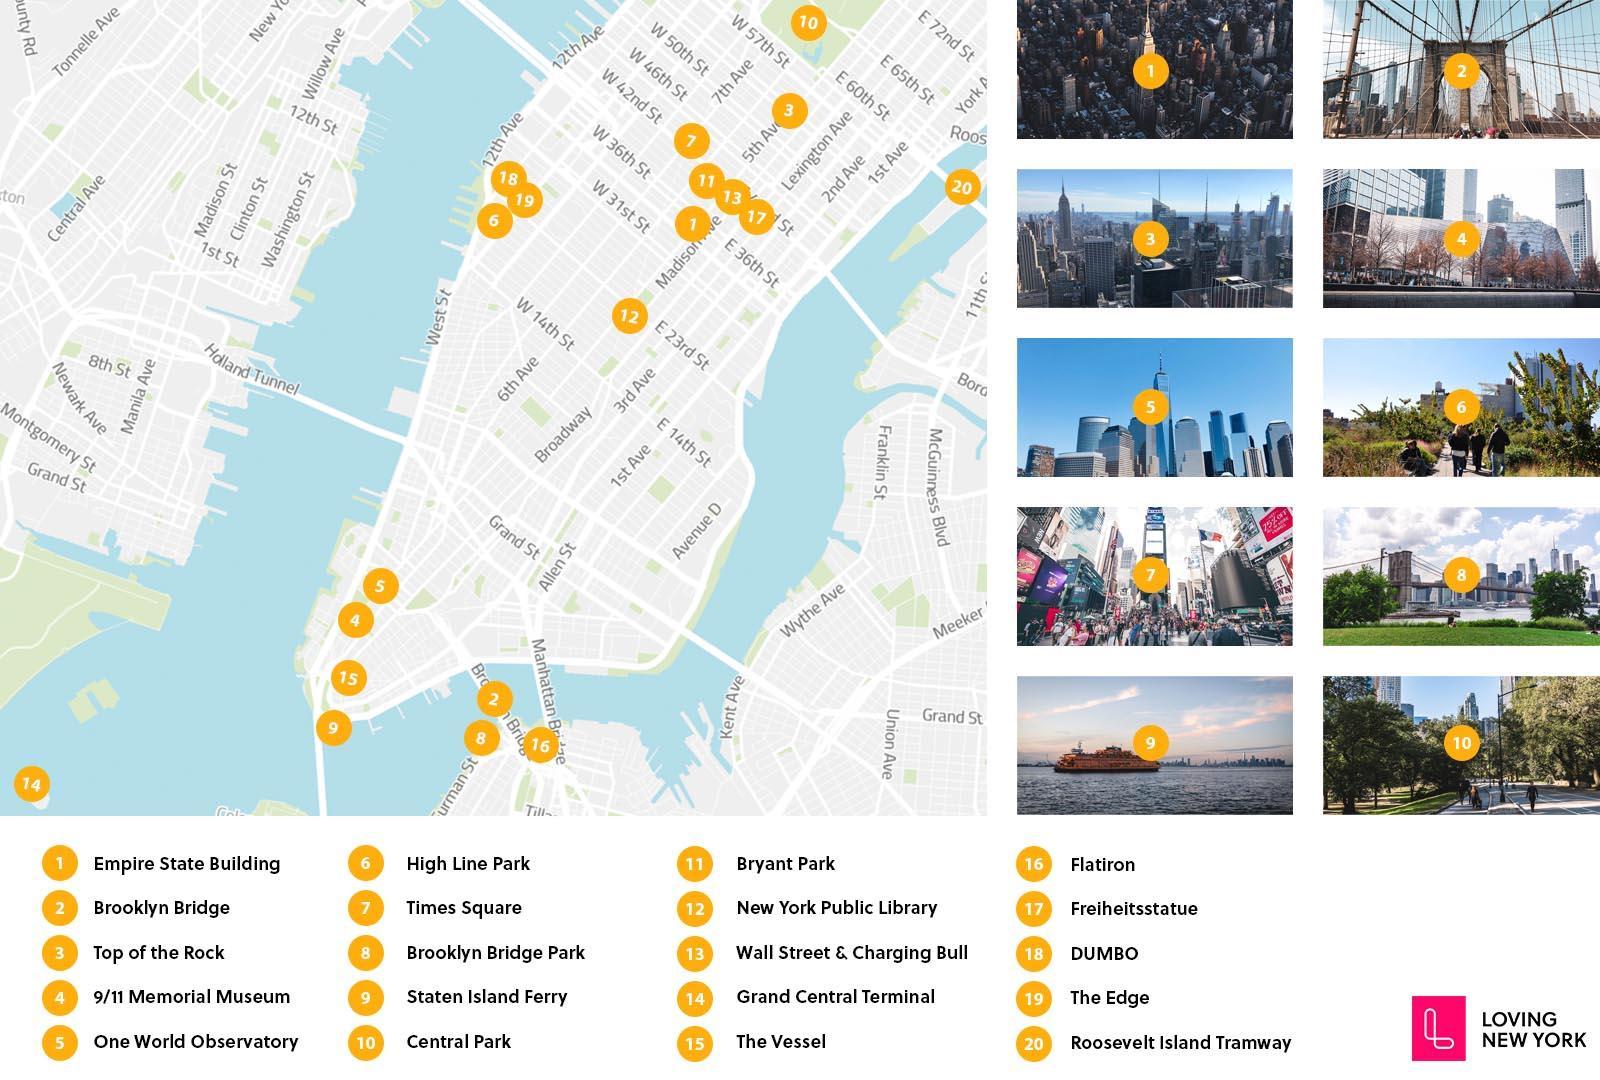 Amerika Karte New York.Die 23 Besten Sehenswürdigkeiten In New York 2019 Inkl Video